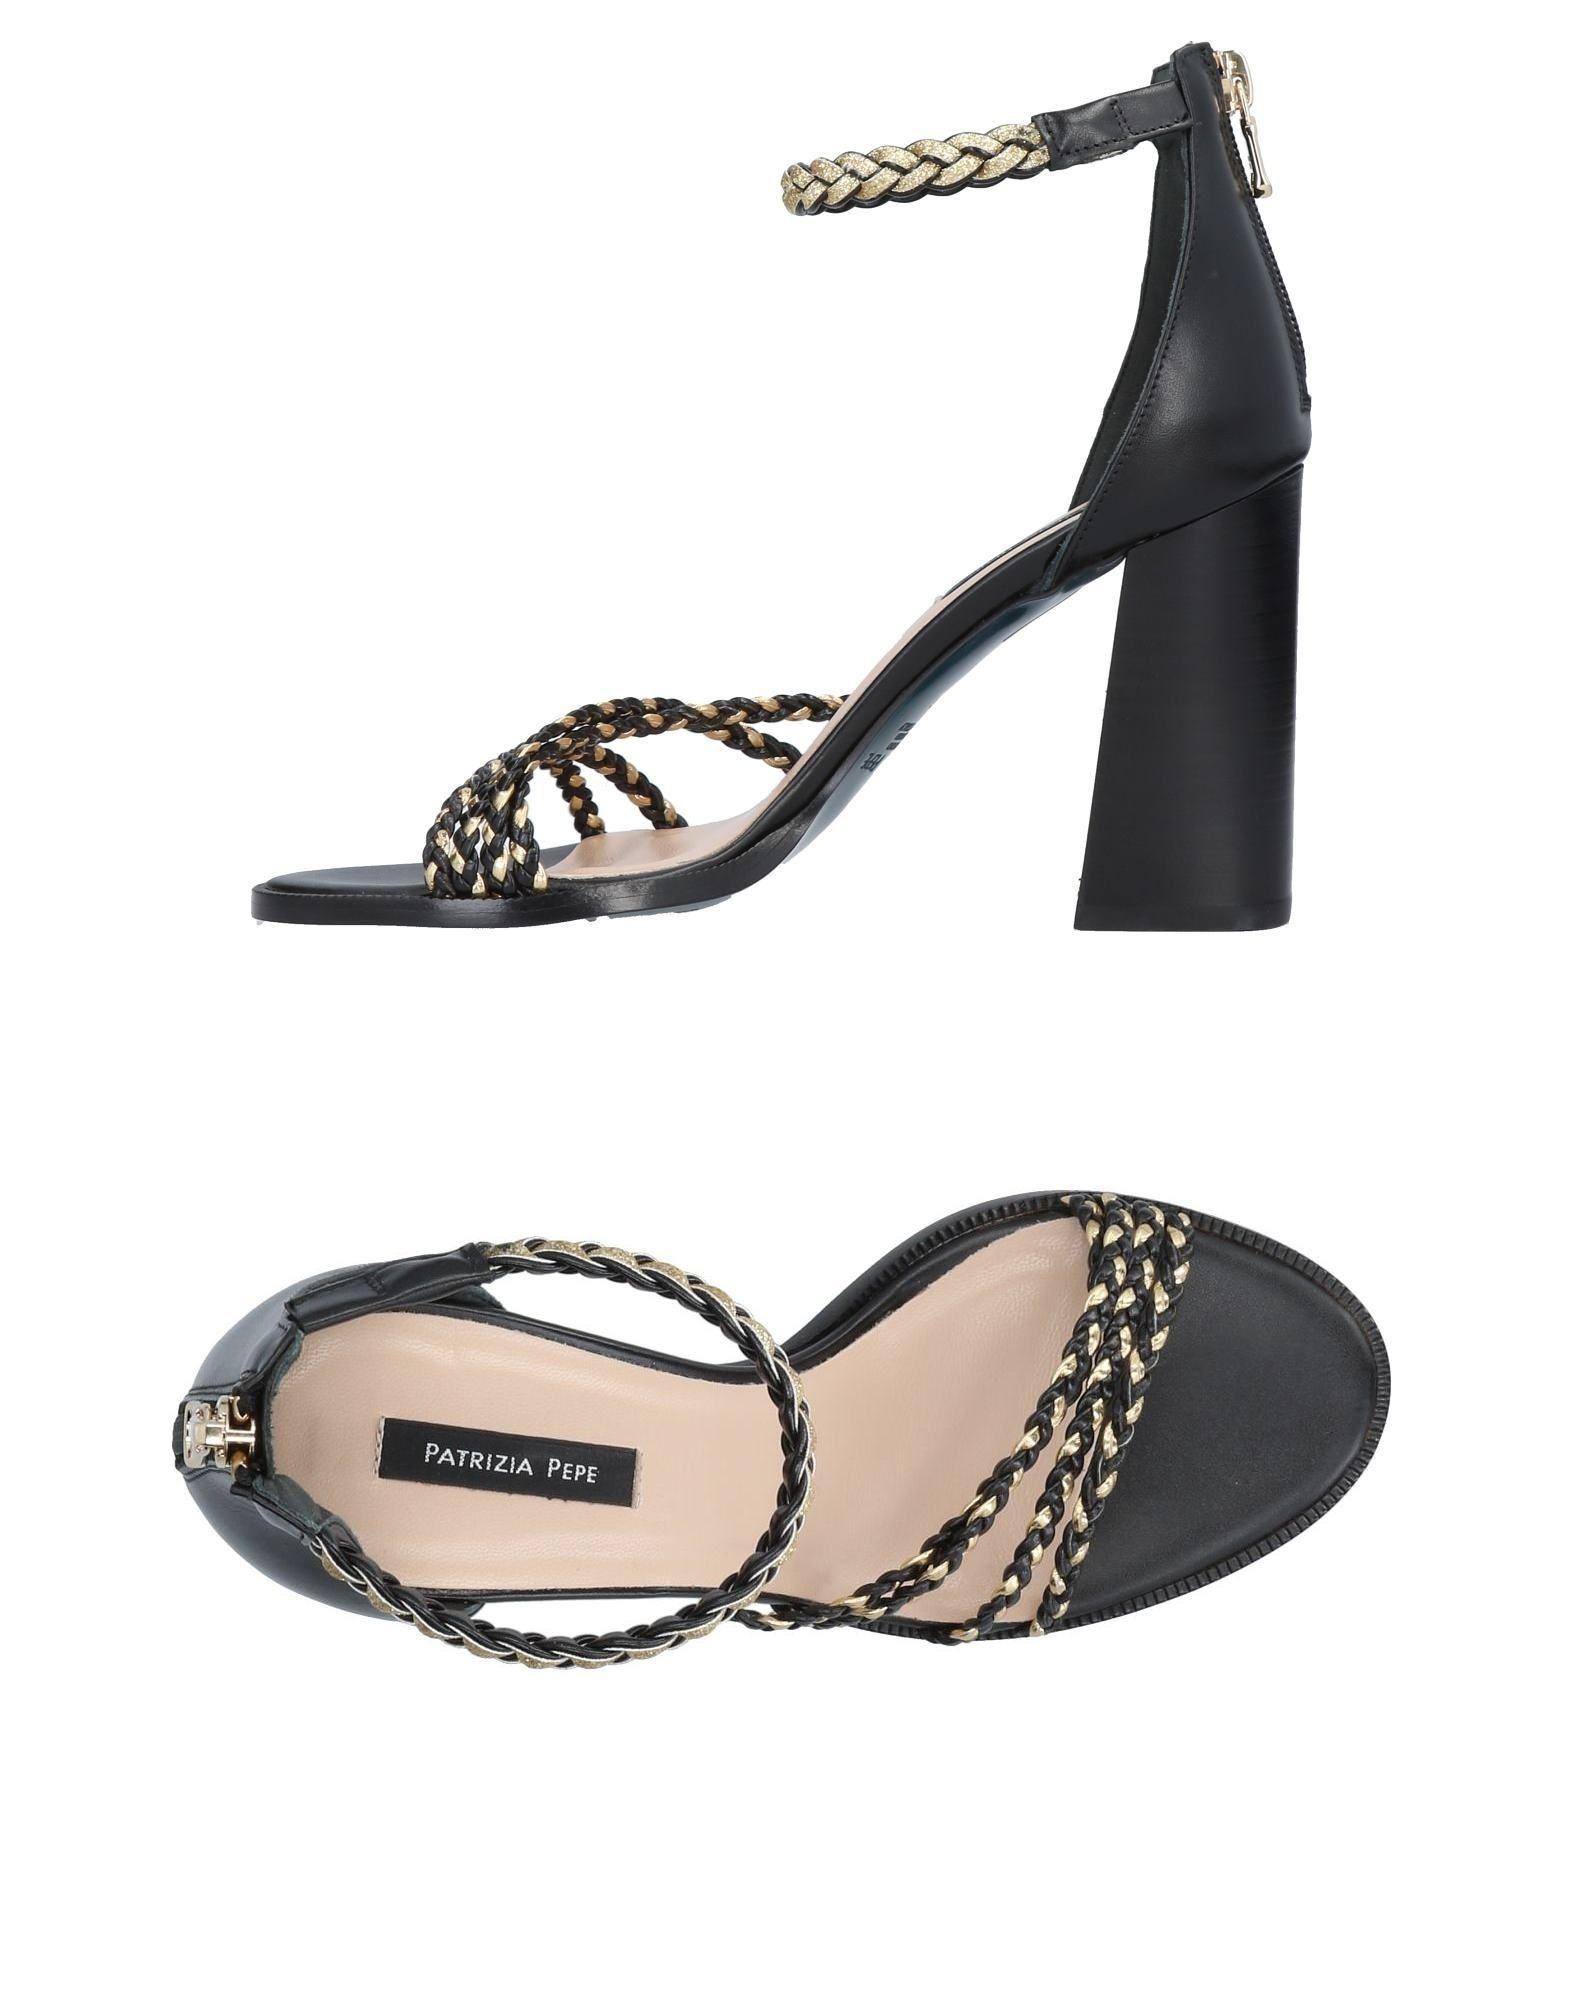 Patrizia Pepe Sandalen Damen  11436450XL Gute Qualität beliebte Schuhe